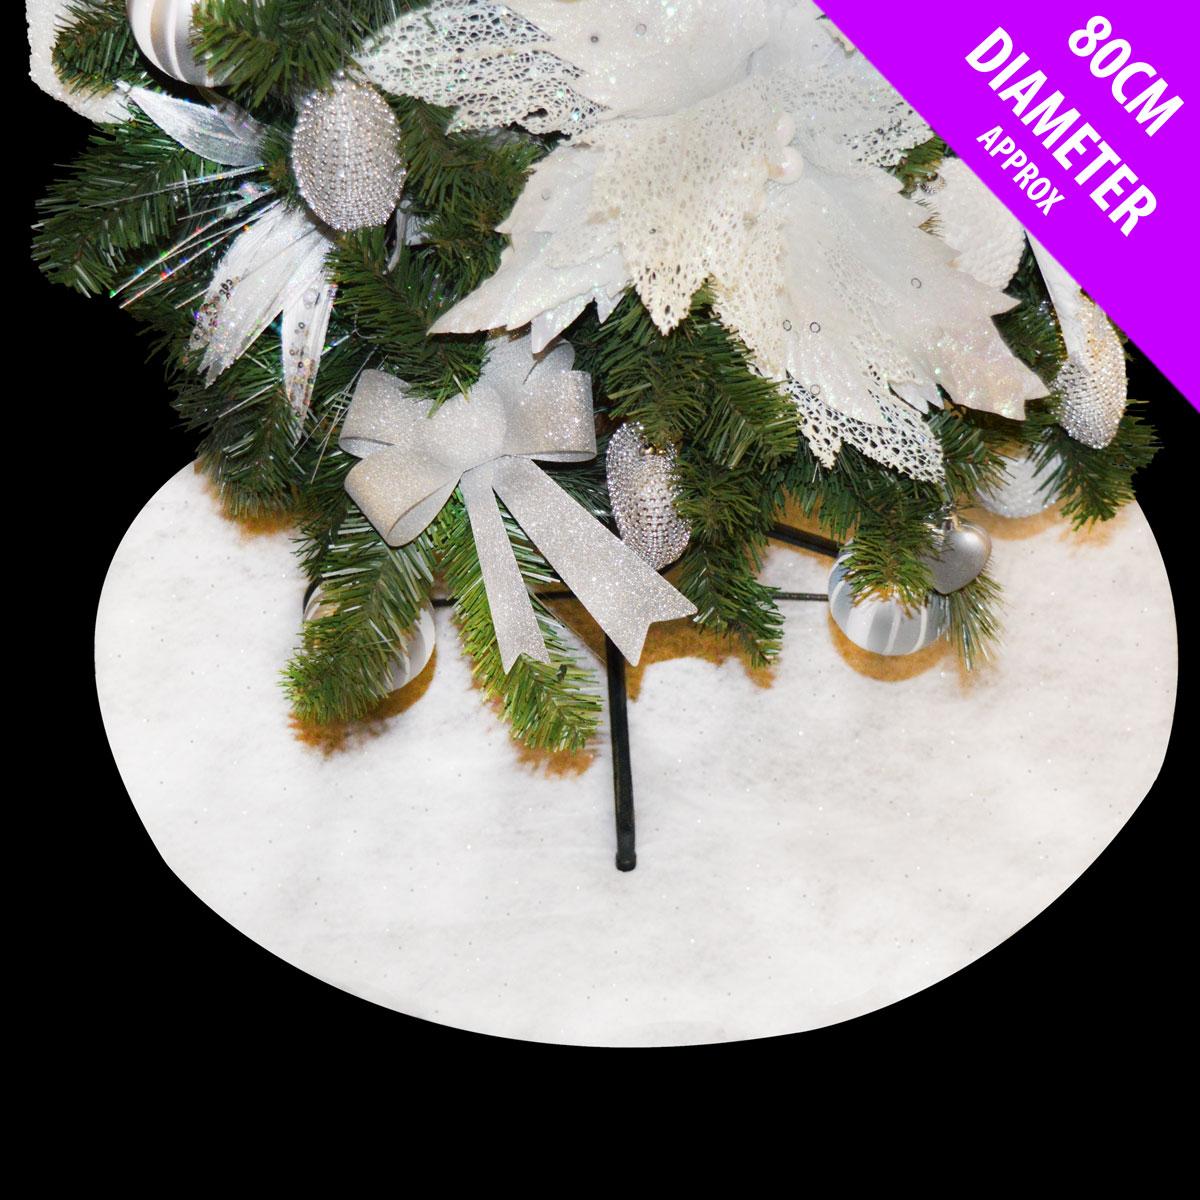 Christmas fake snow blanket tree skirt